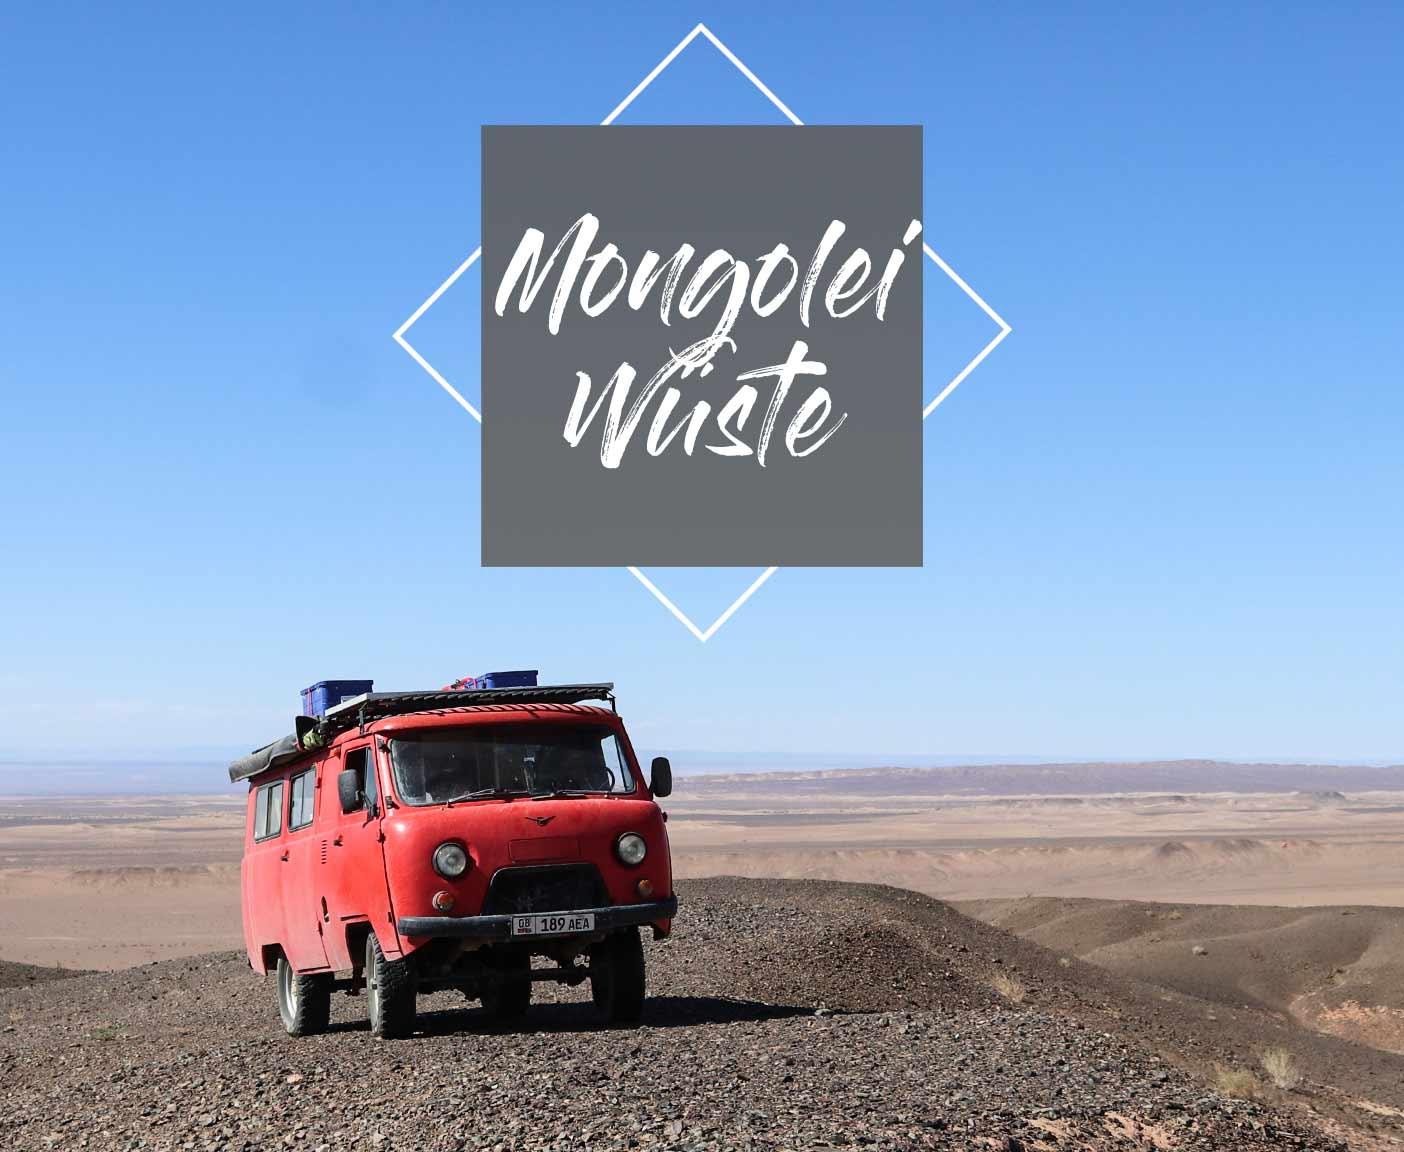 mongolei-uaz-reise-camper-gobi-wueste-desert-abenteuer-expedition-4x4